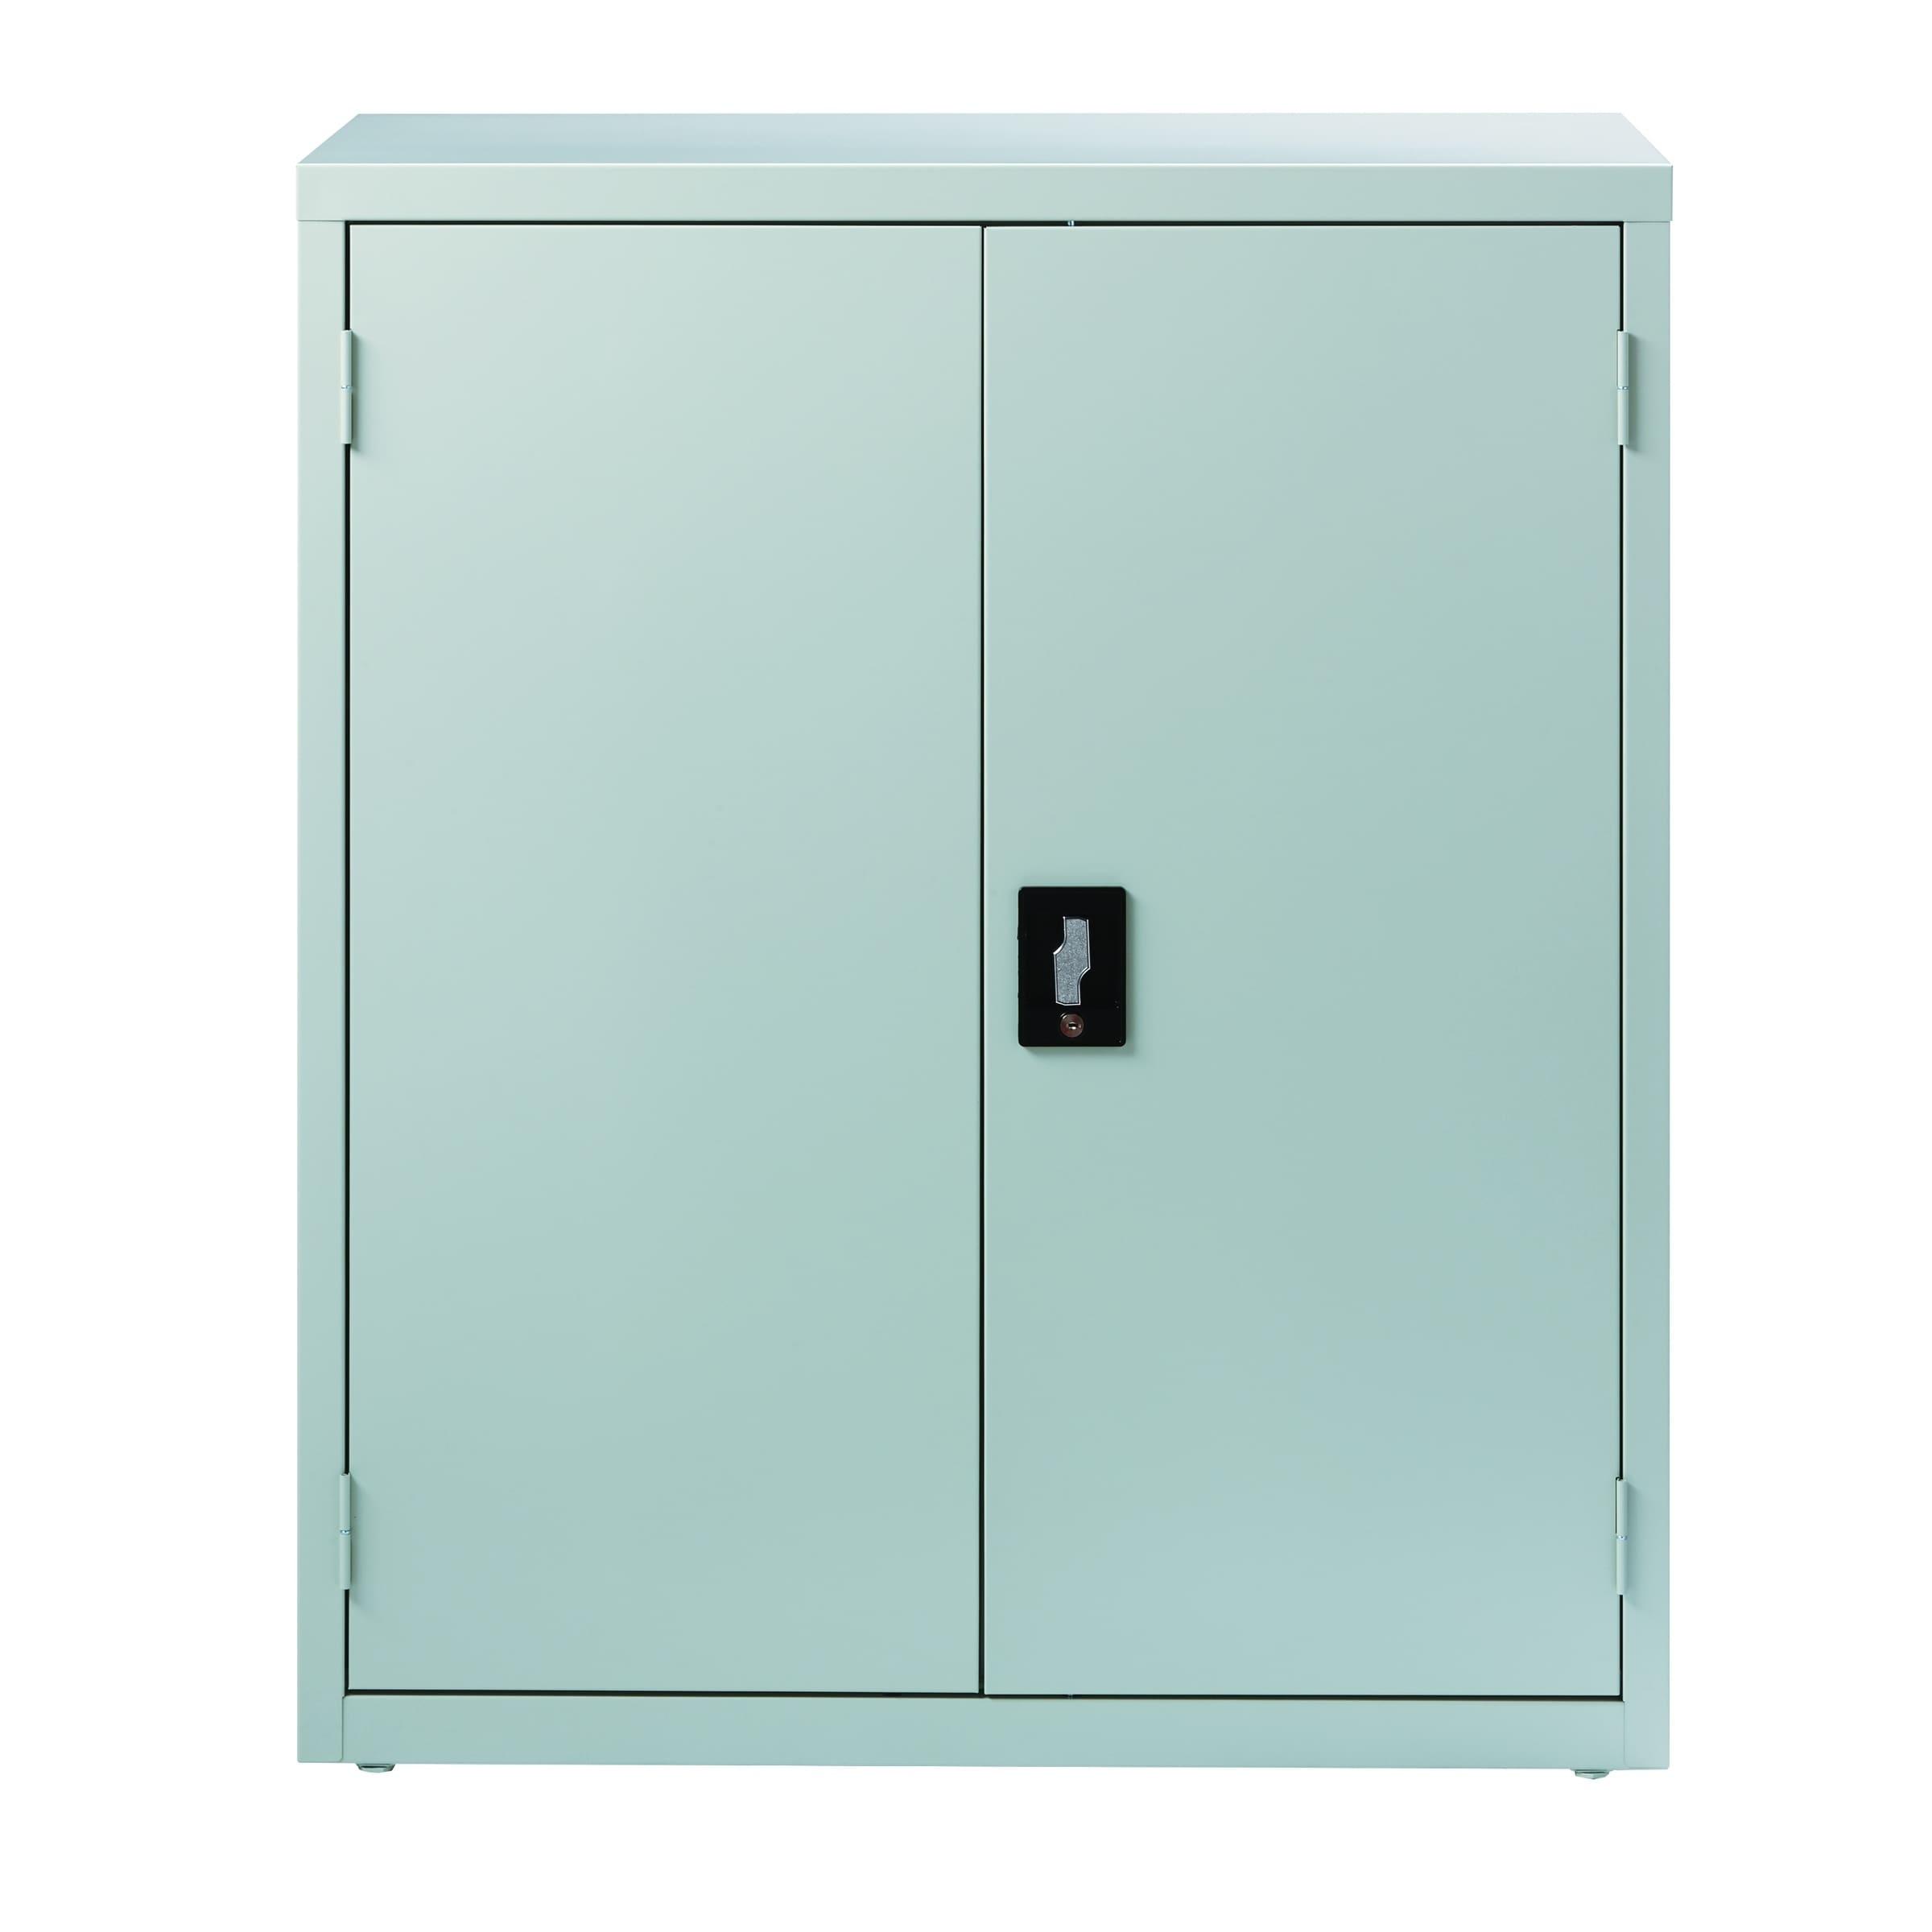 Hirsh 3 Shelf Storage Cabinet 18 Inch Deep Light Gray Free Shipping Today 23967489